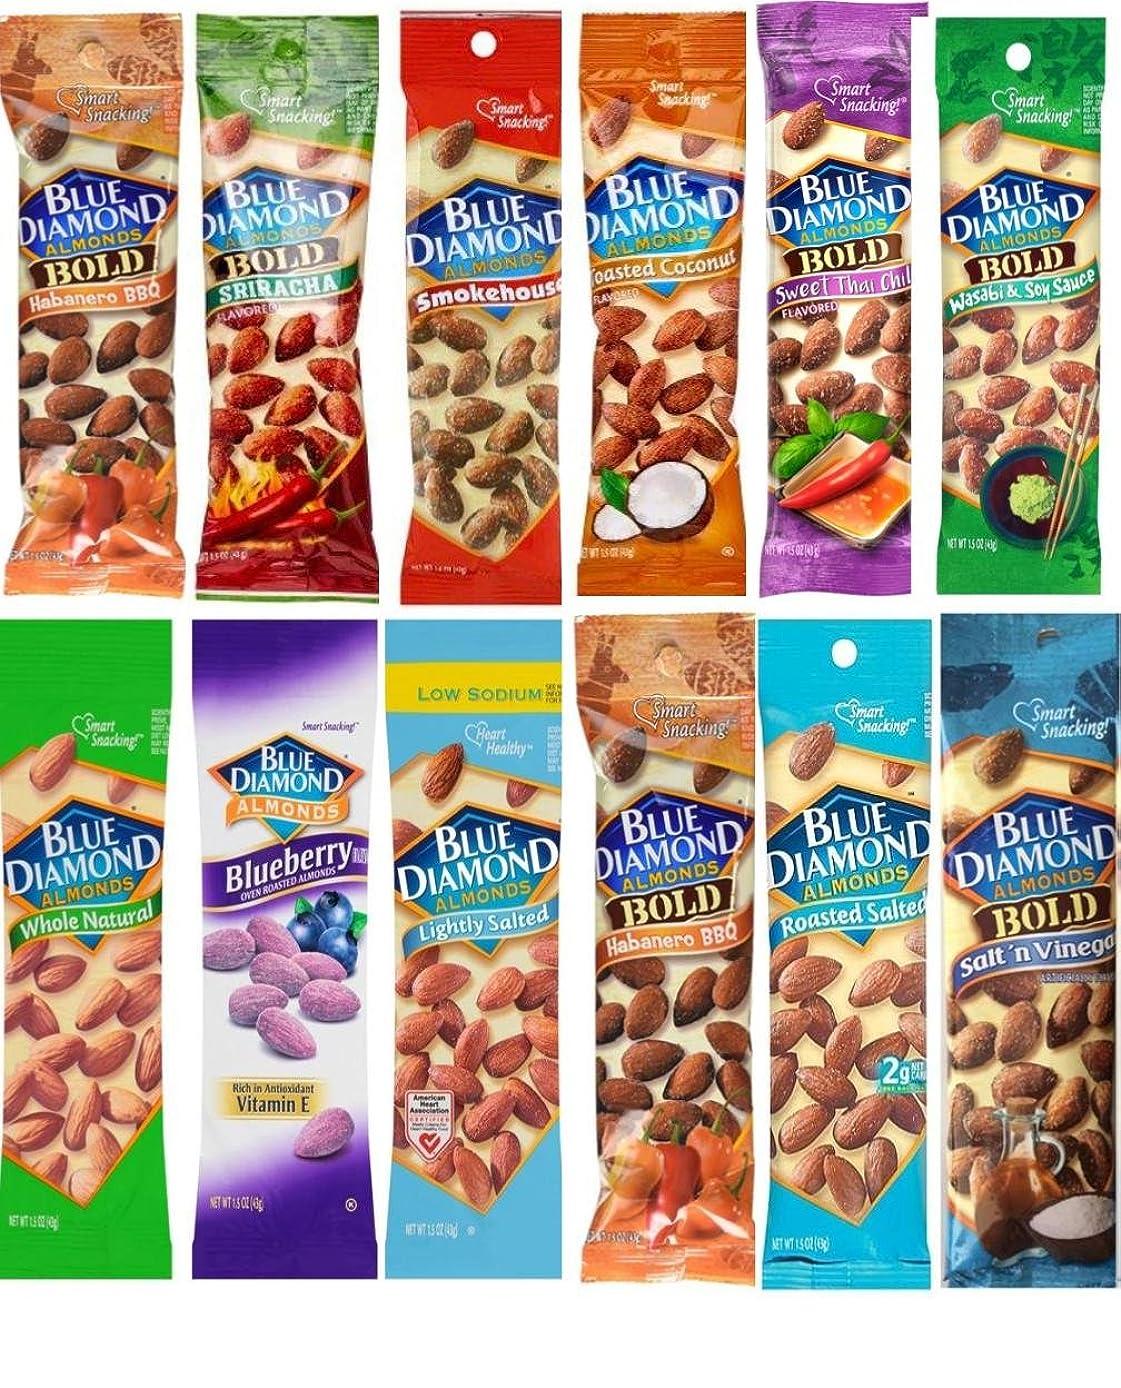 Blue Diamond Almonds 1.5 oz pouches 12 Flavor Variety Pack